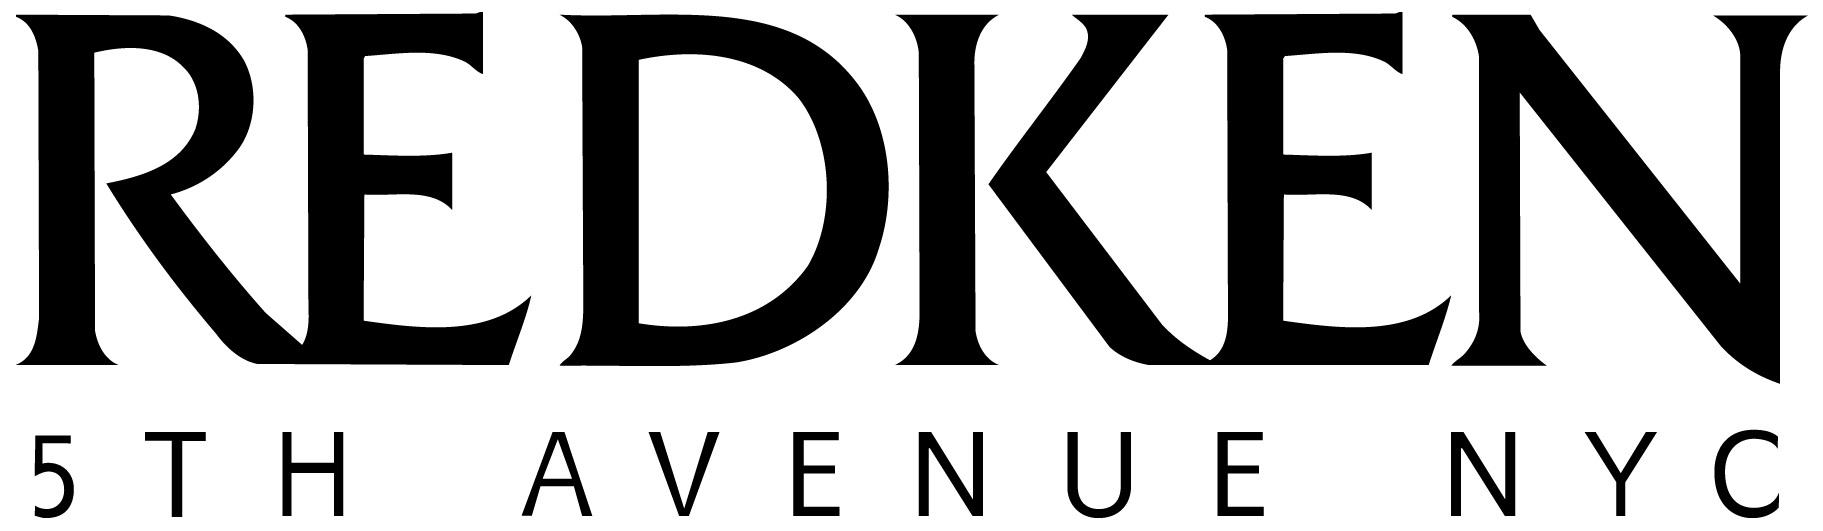 Redken_5th_Avenue_NYC_(logo)